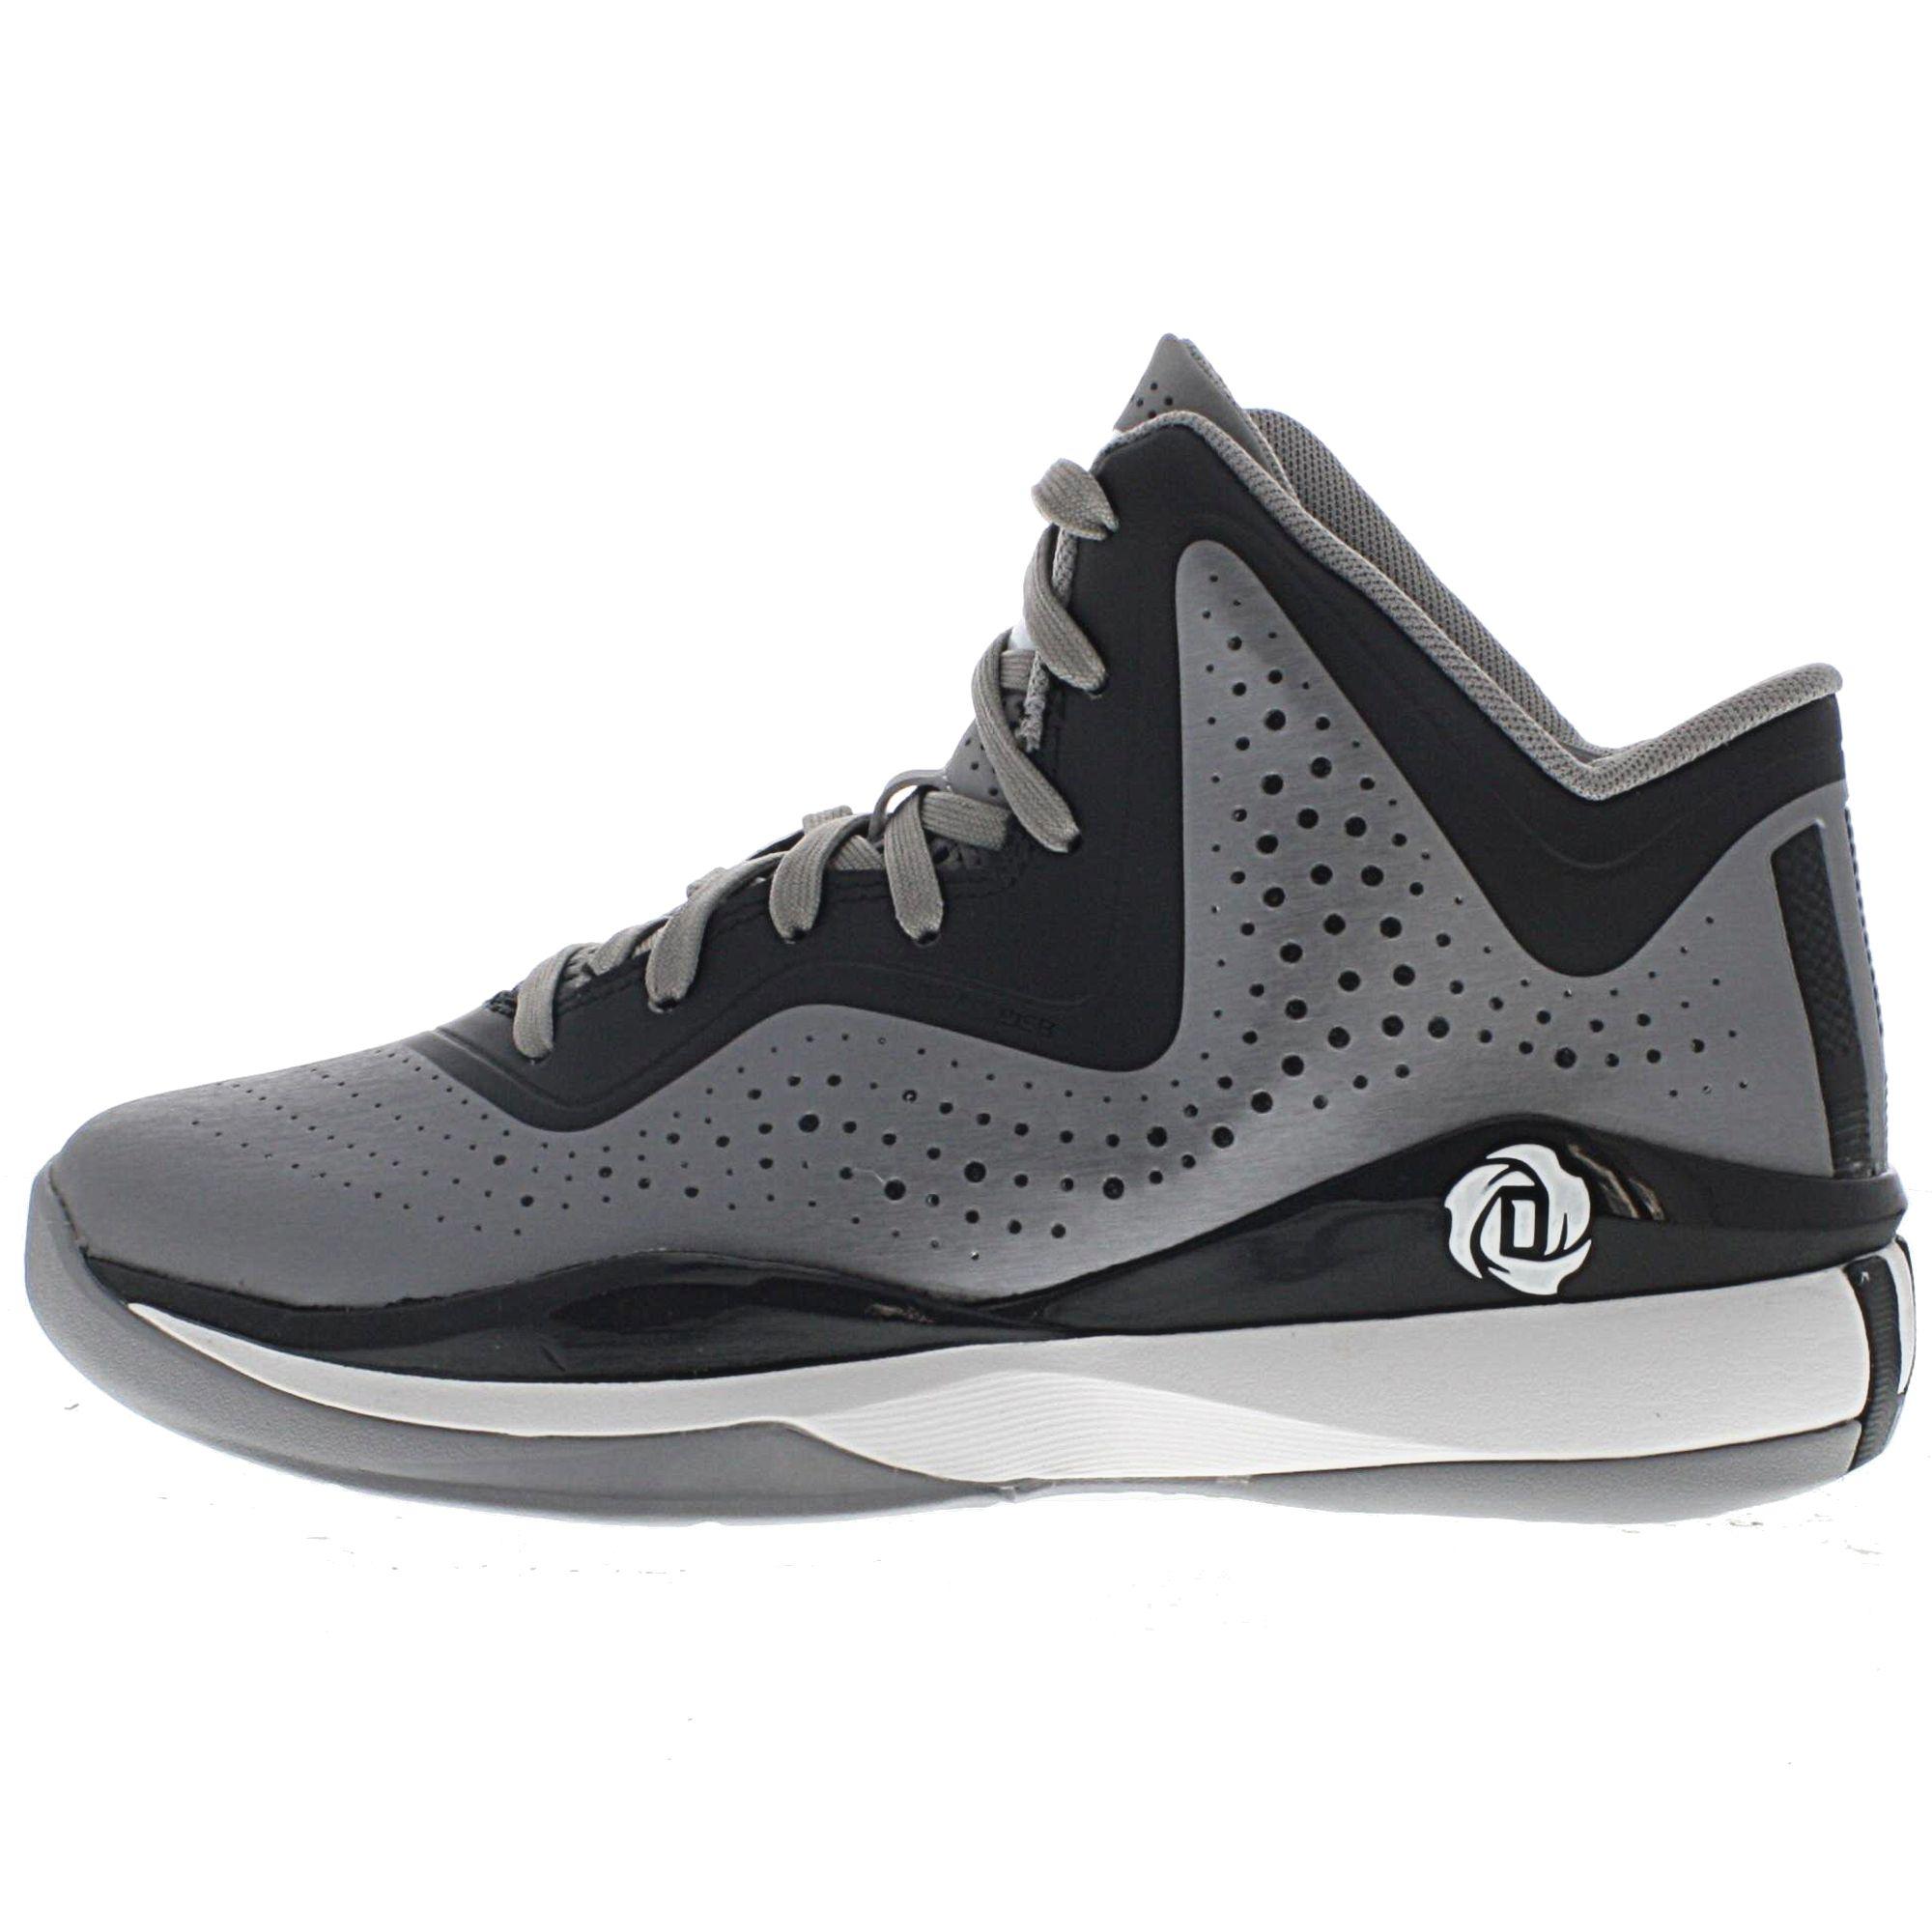 half off 99c1e 1dfb2 adidas Derrick Rose 773 III Jr Basketbol Ayakkabısı